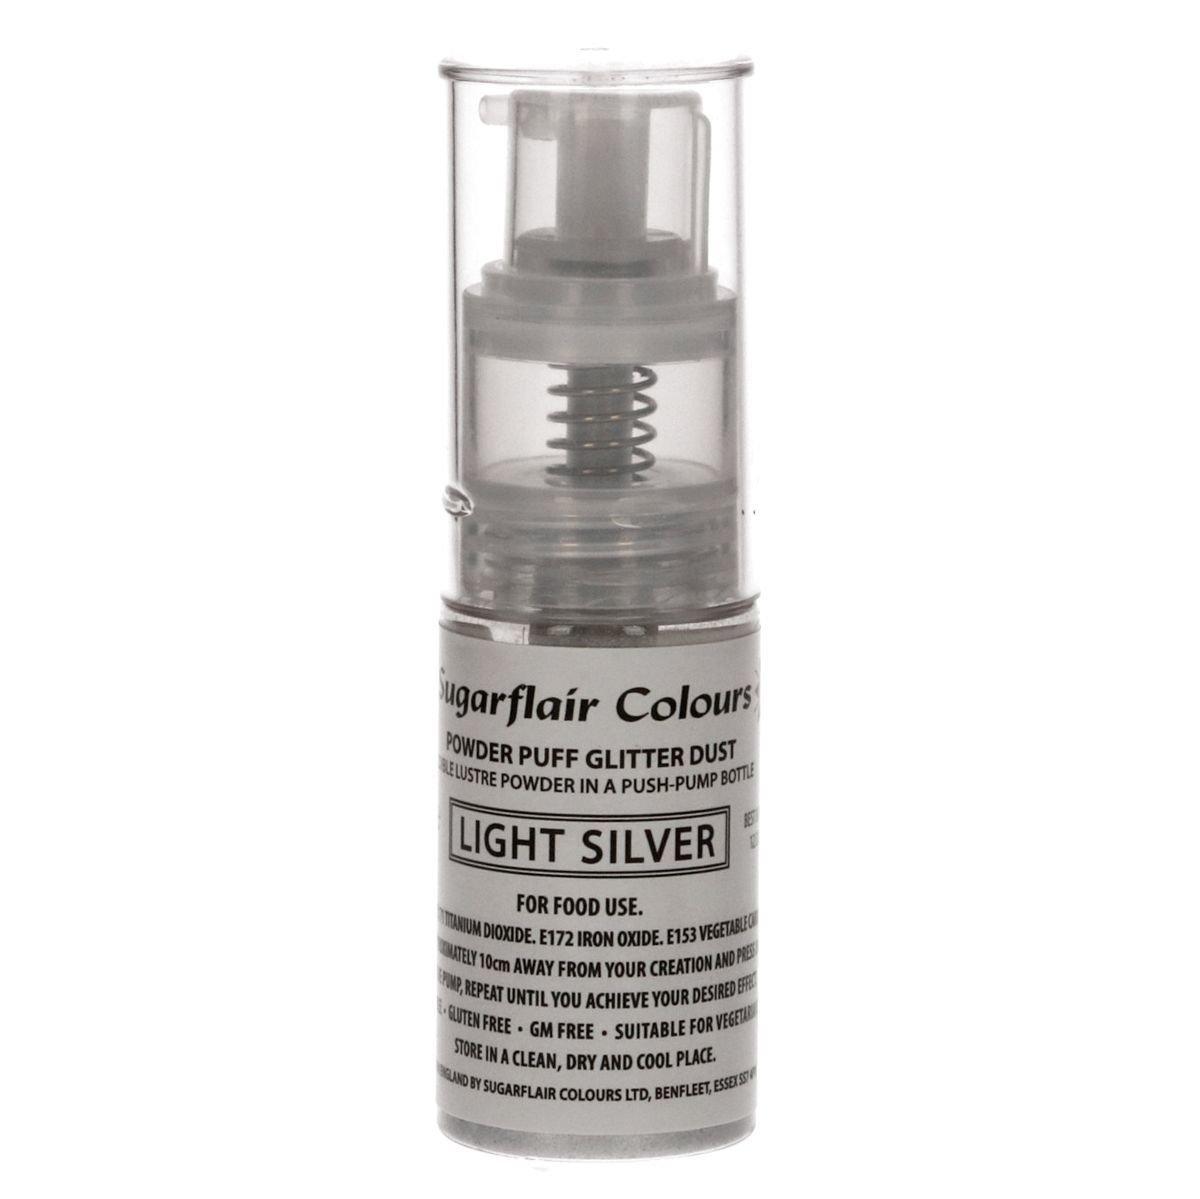 Sugarflair Powder Puff Glitter Dust Pump Spray -LIGHT SILVER 10g Βρώσιμο γκλίτερ ανοιχτό ασημί σε αντλία